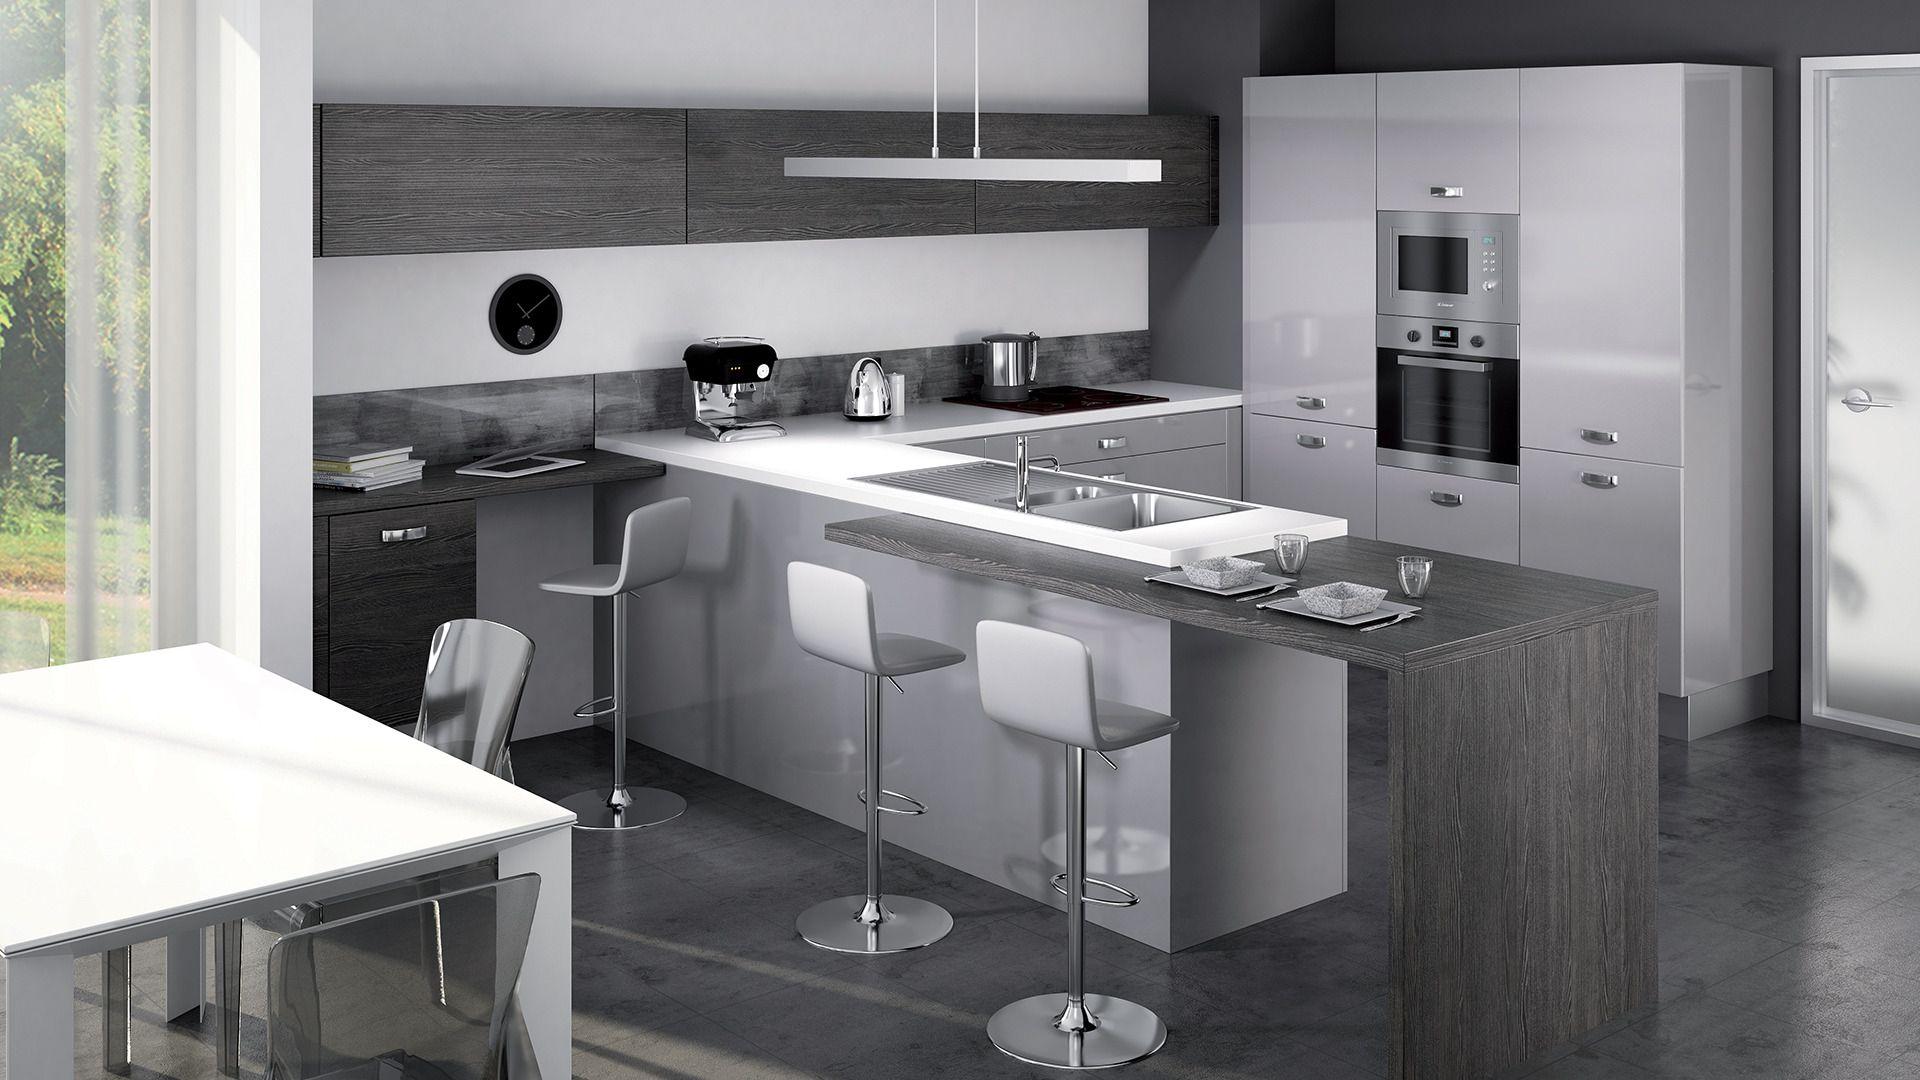 cuisine quip e light style design disponible en 5. Black Bedroom Furniture Sets. Home Design Ideas